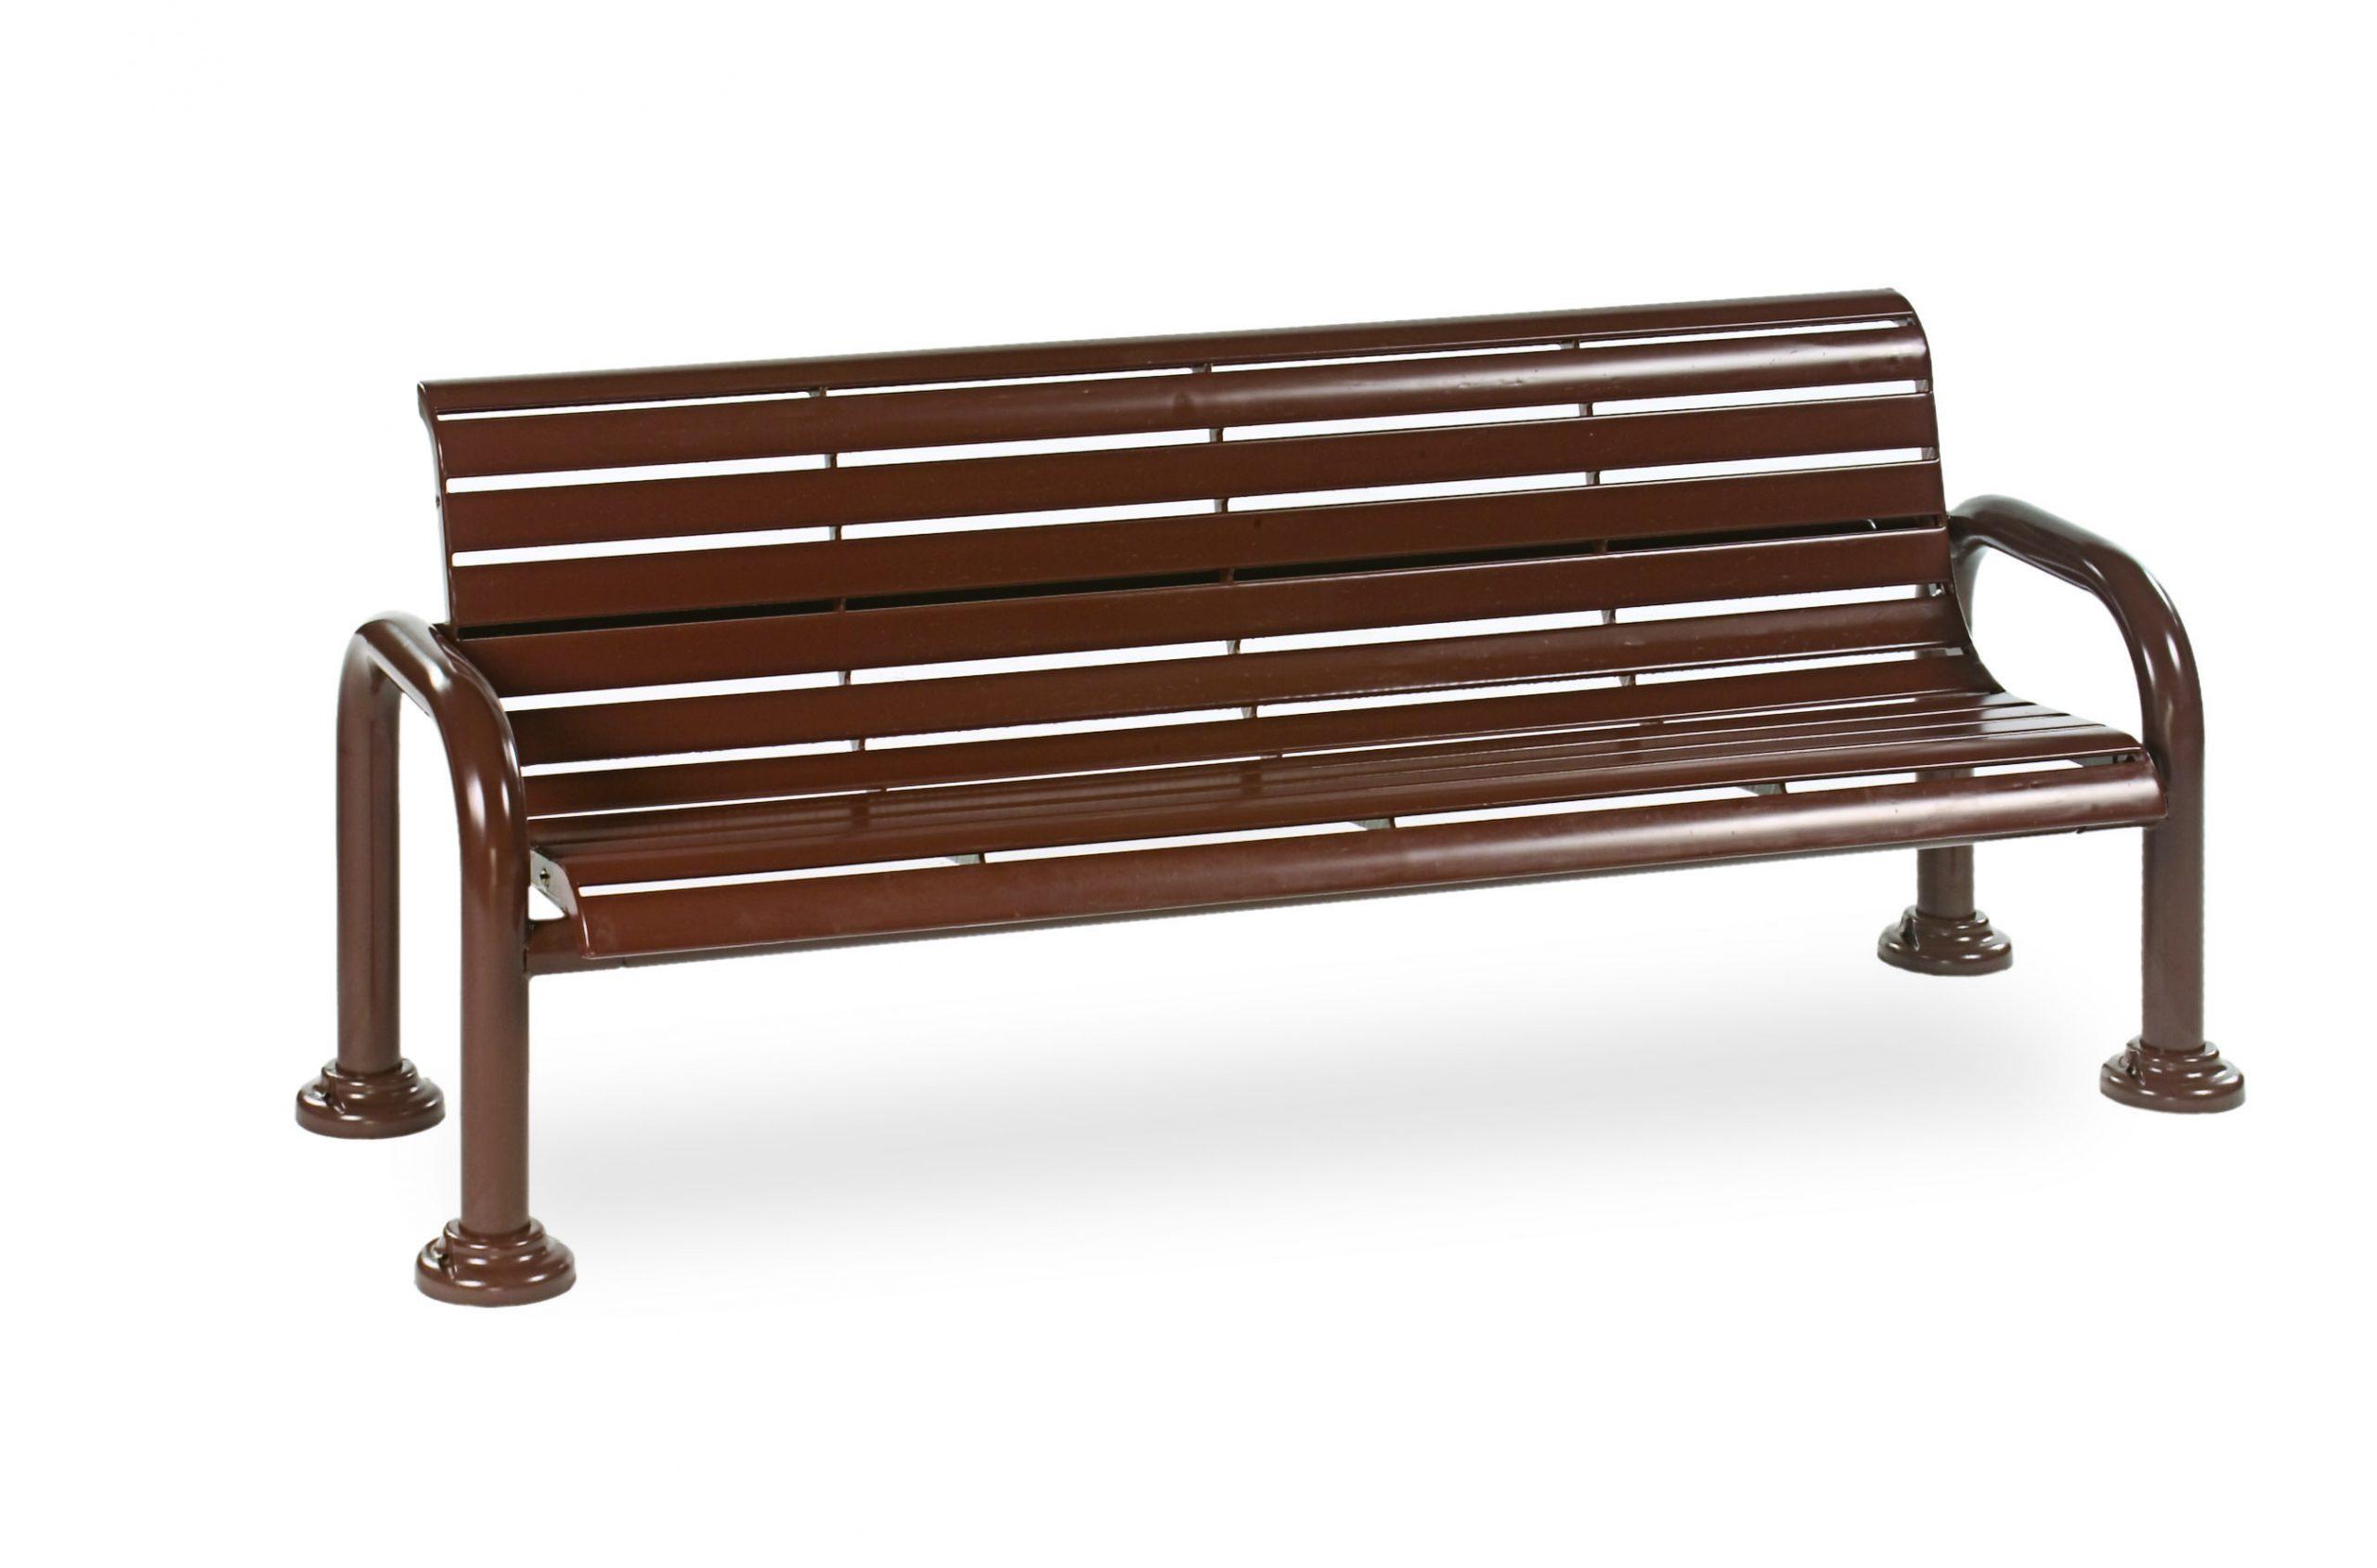 6' Contemporary Bench with Back - Slat - Portable/Surface Mount (MRCN420S)